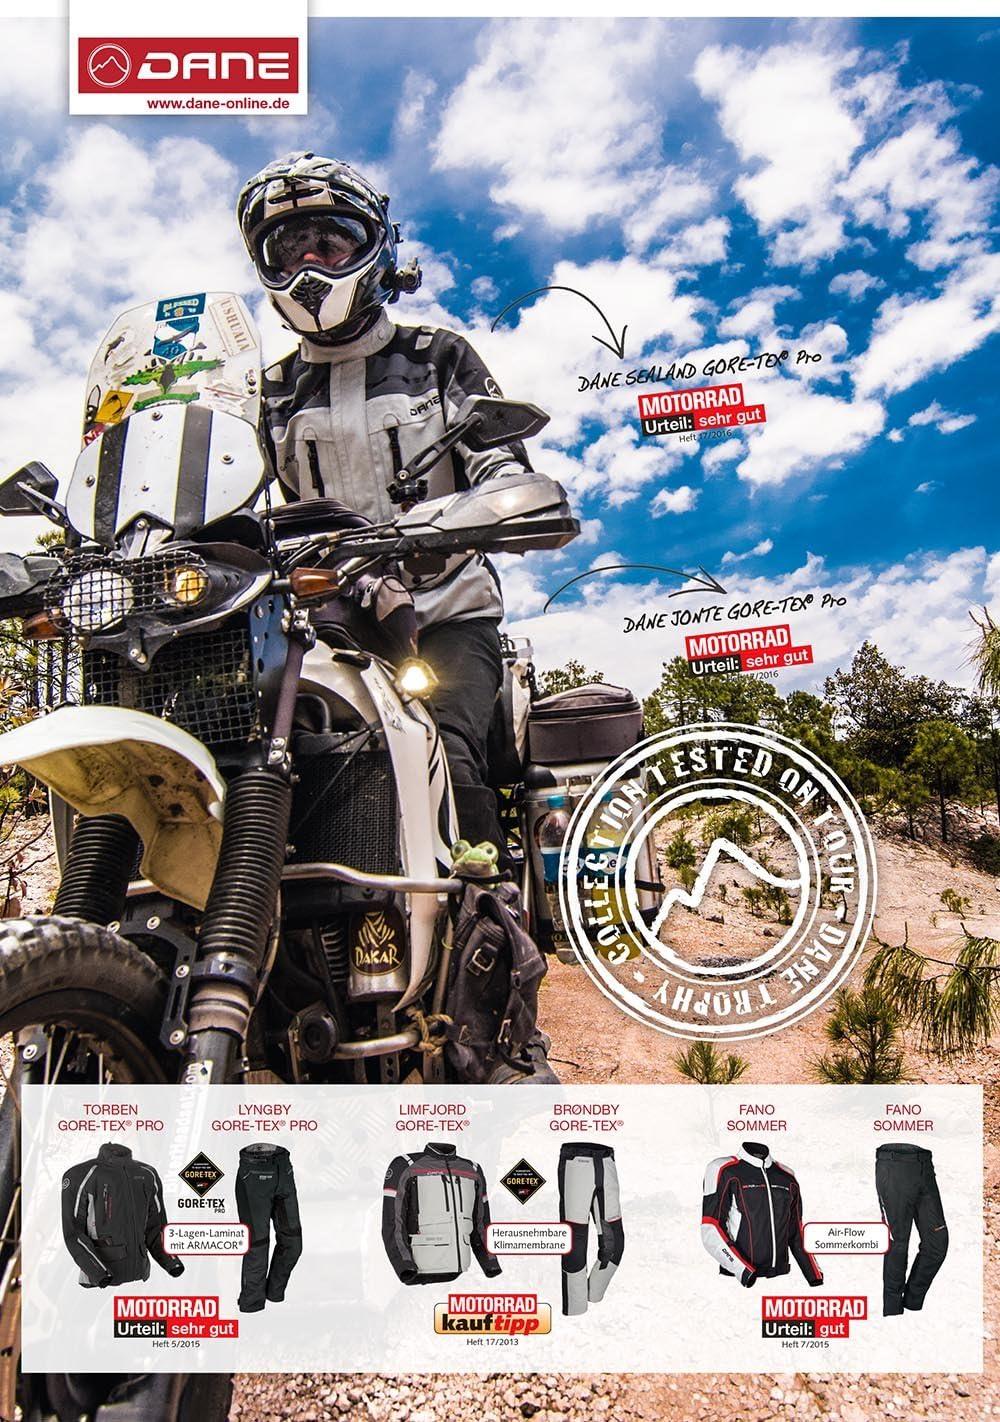 Dane JONTE GORE-TEX/® Pro Motorradhose Gr/ö/ße 50